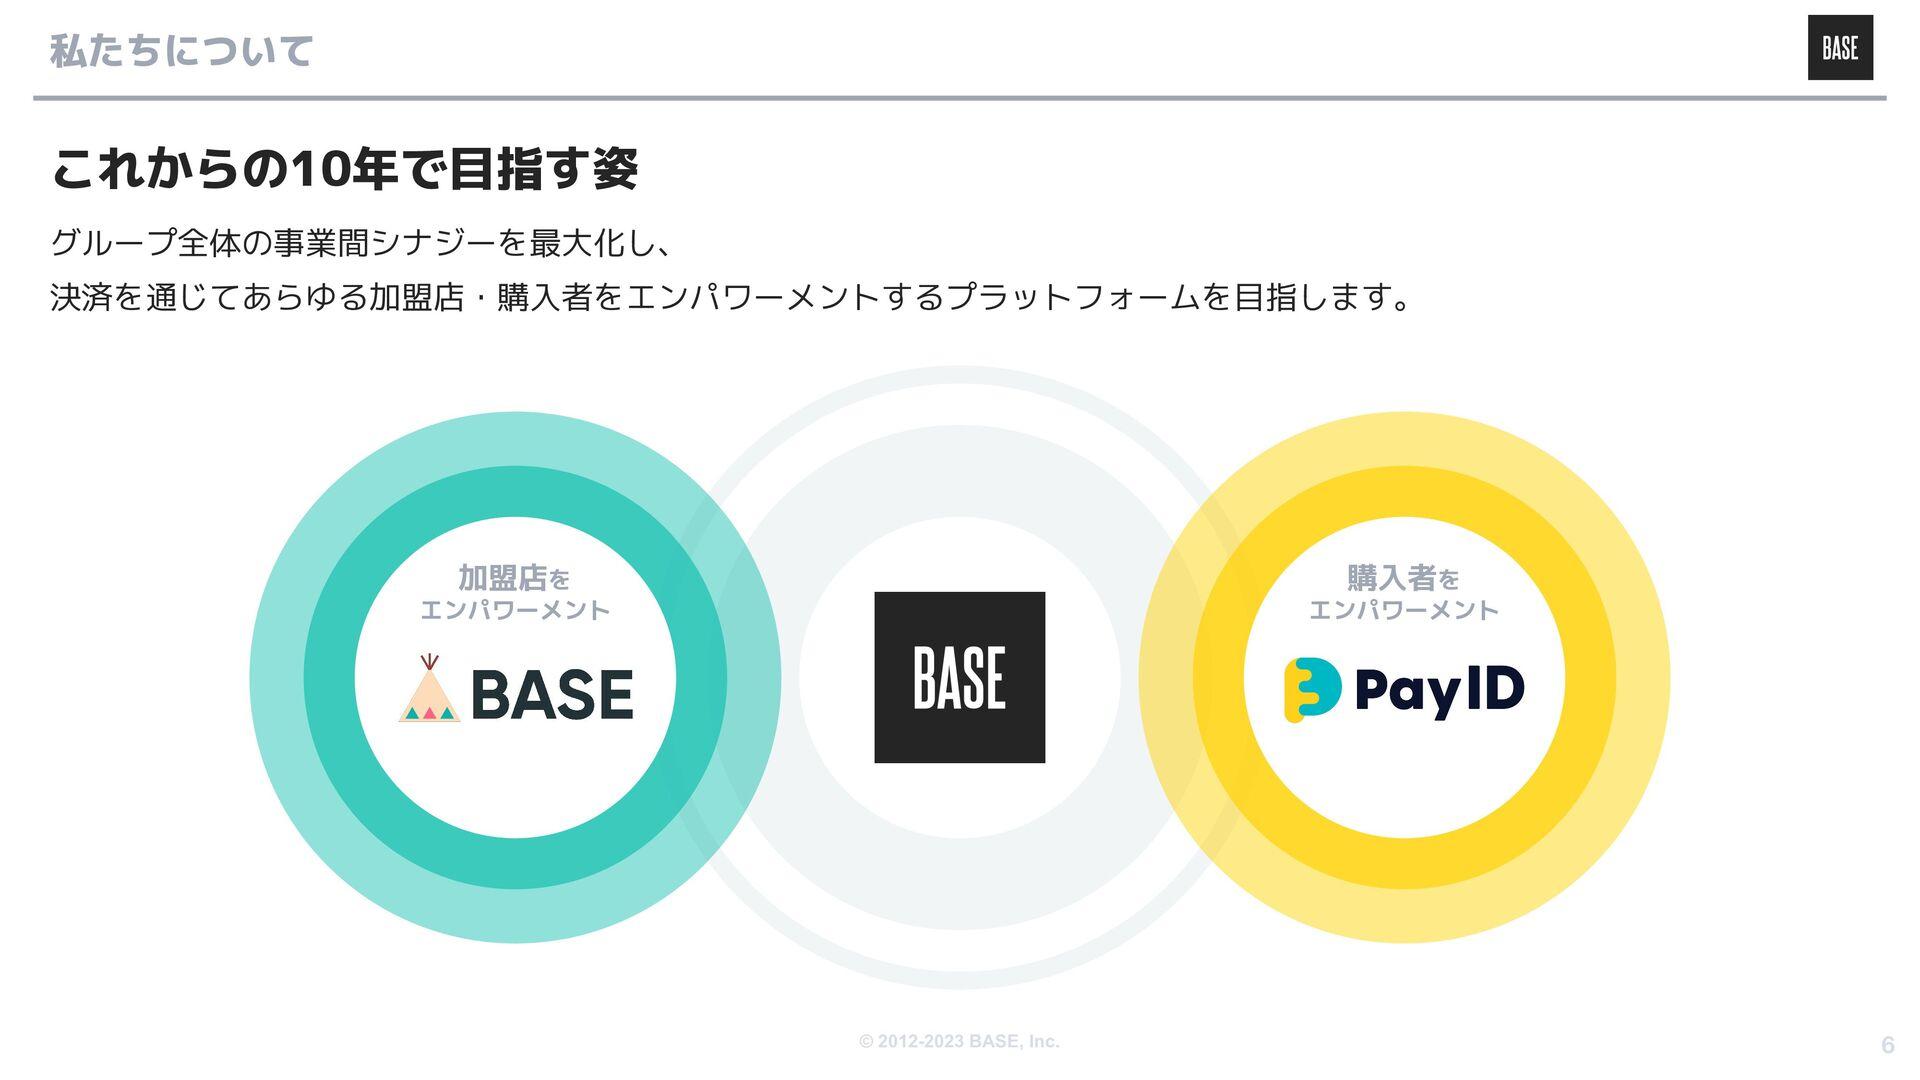 © 2012-2020 BASE, Inc. 6 BASE/BASE BANK事業を通じて、オ...